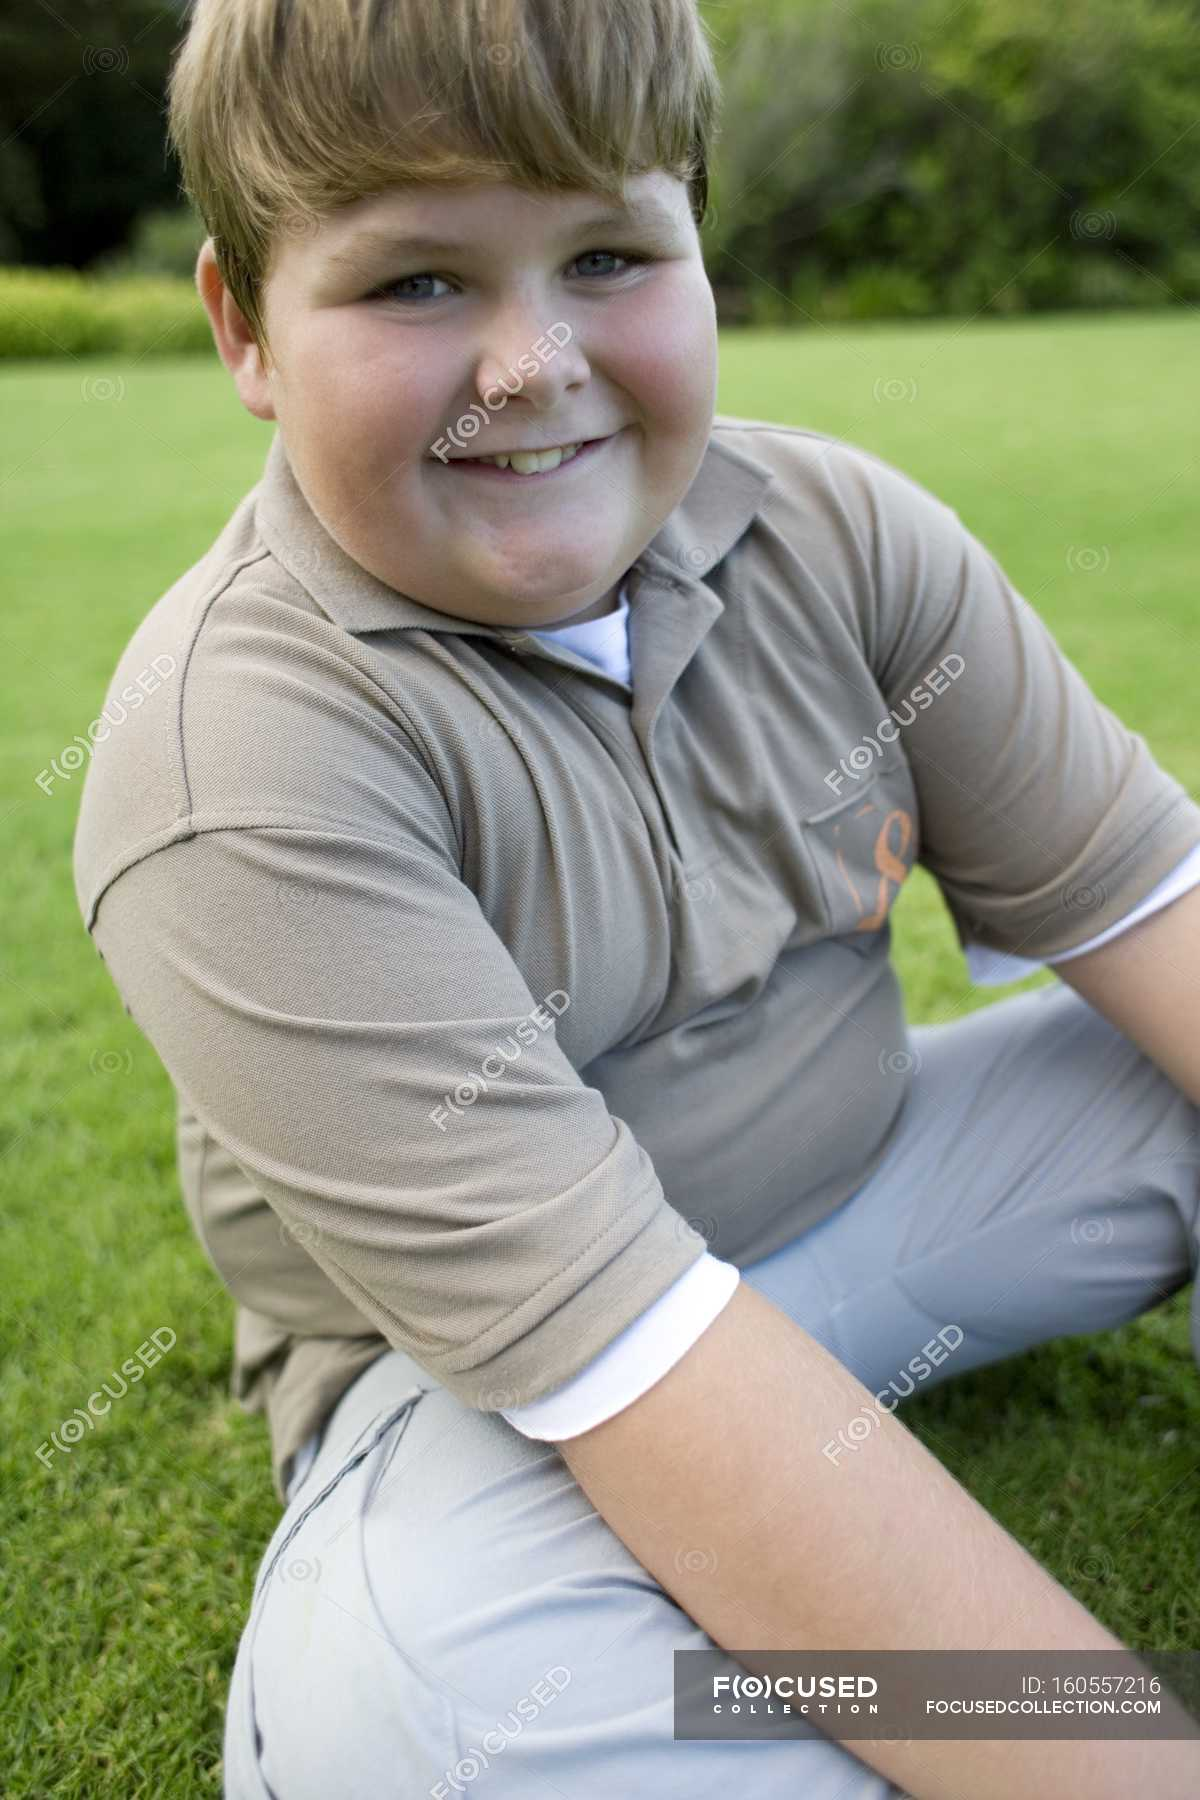 Happy chubby boy sitting on grass. — kid, happiness